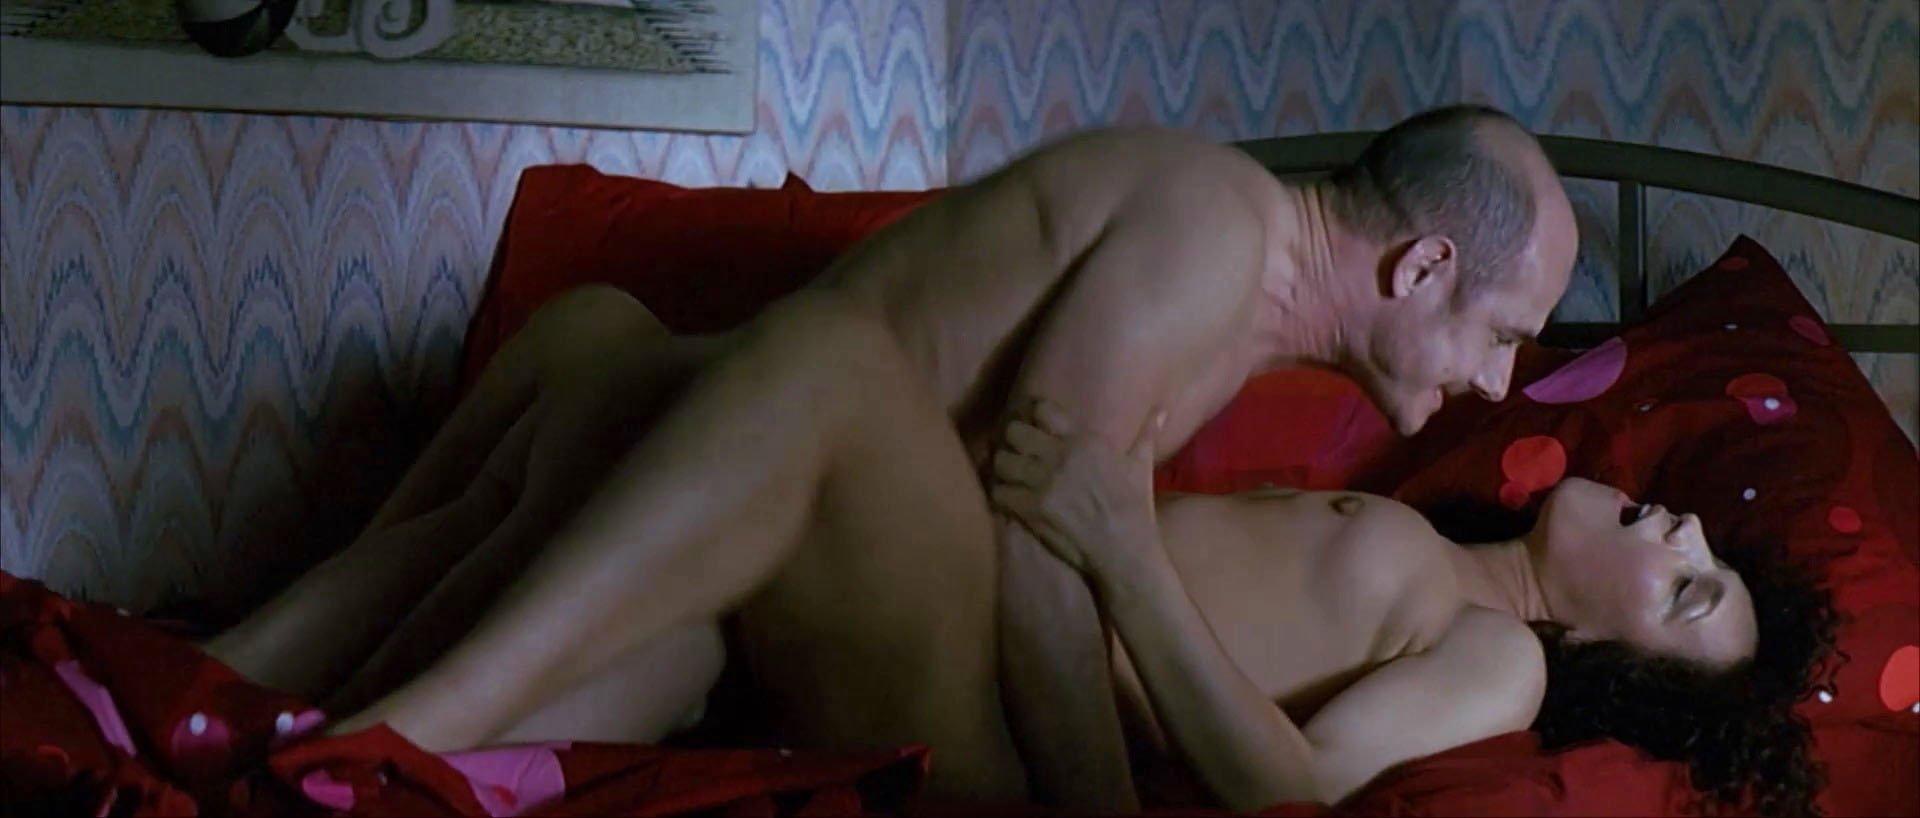 Farida Rahouadj nude - How Much Do You Love Me (2005)